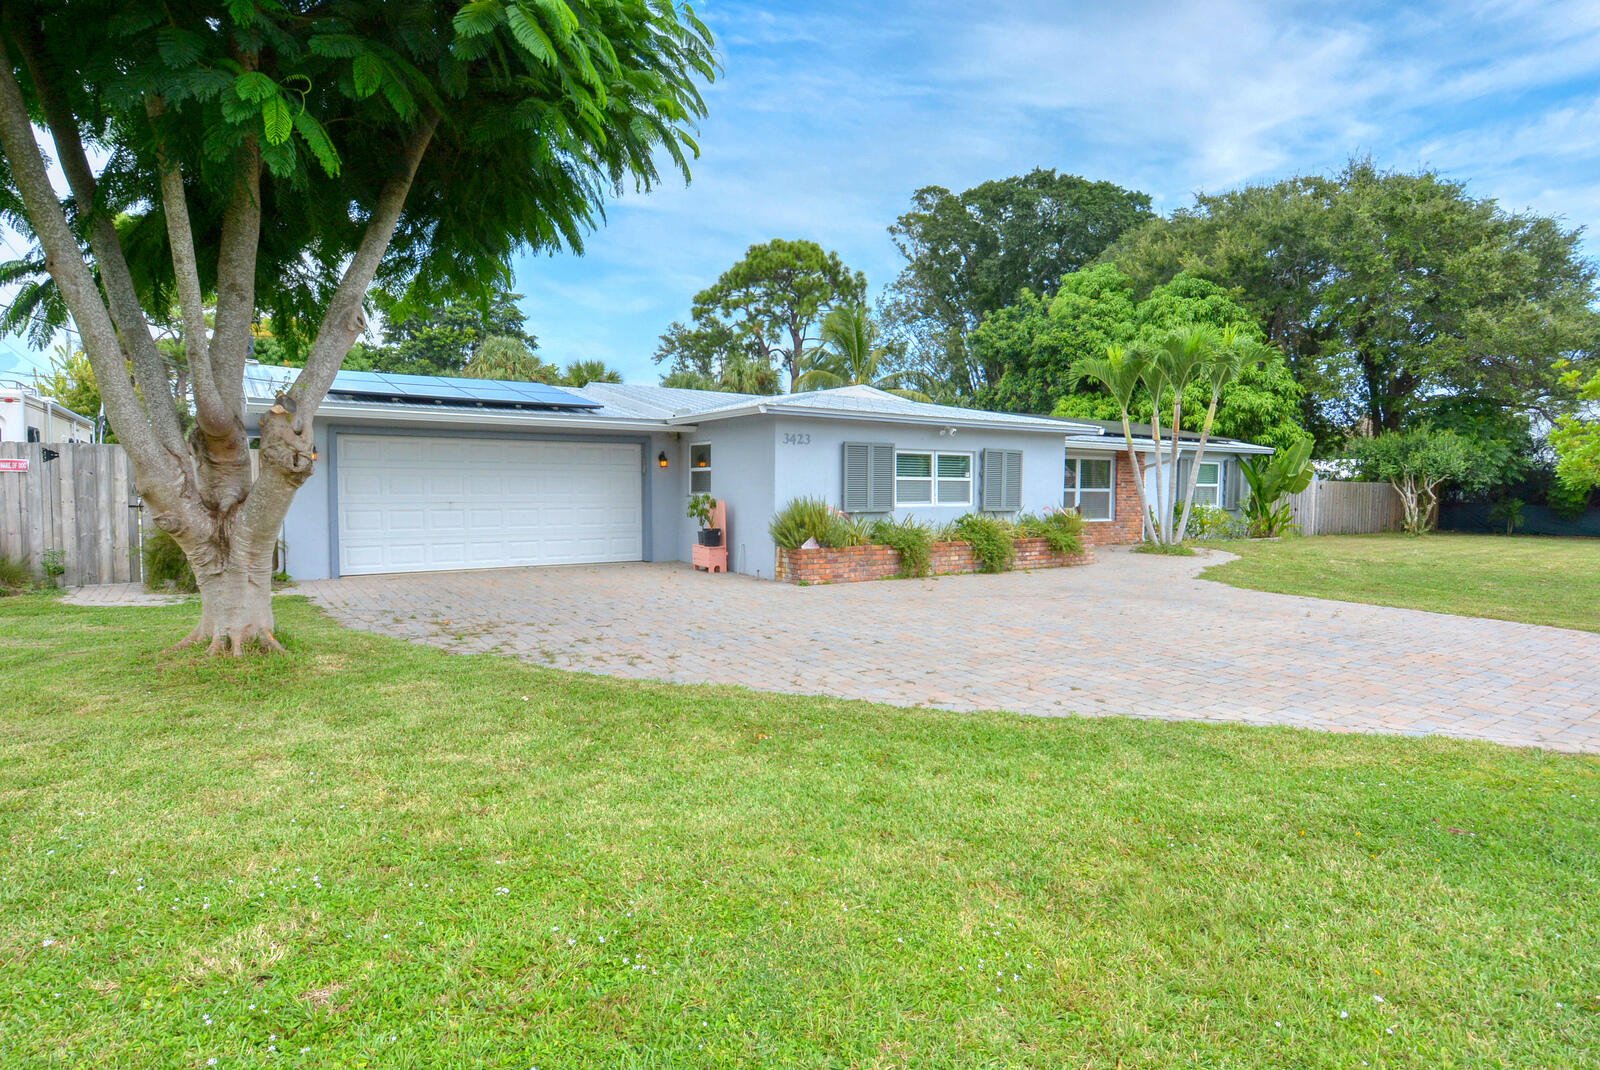 3423 Jefferson, Stuart, Florida 34997